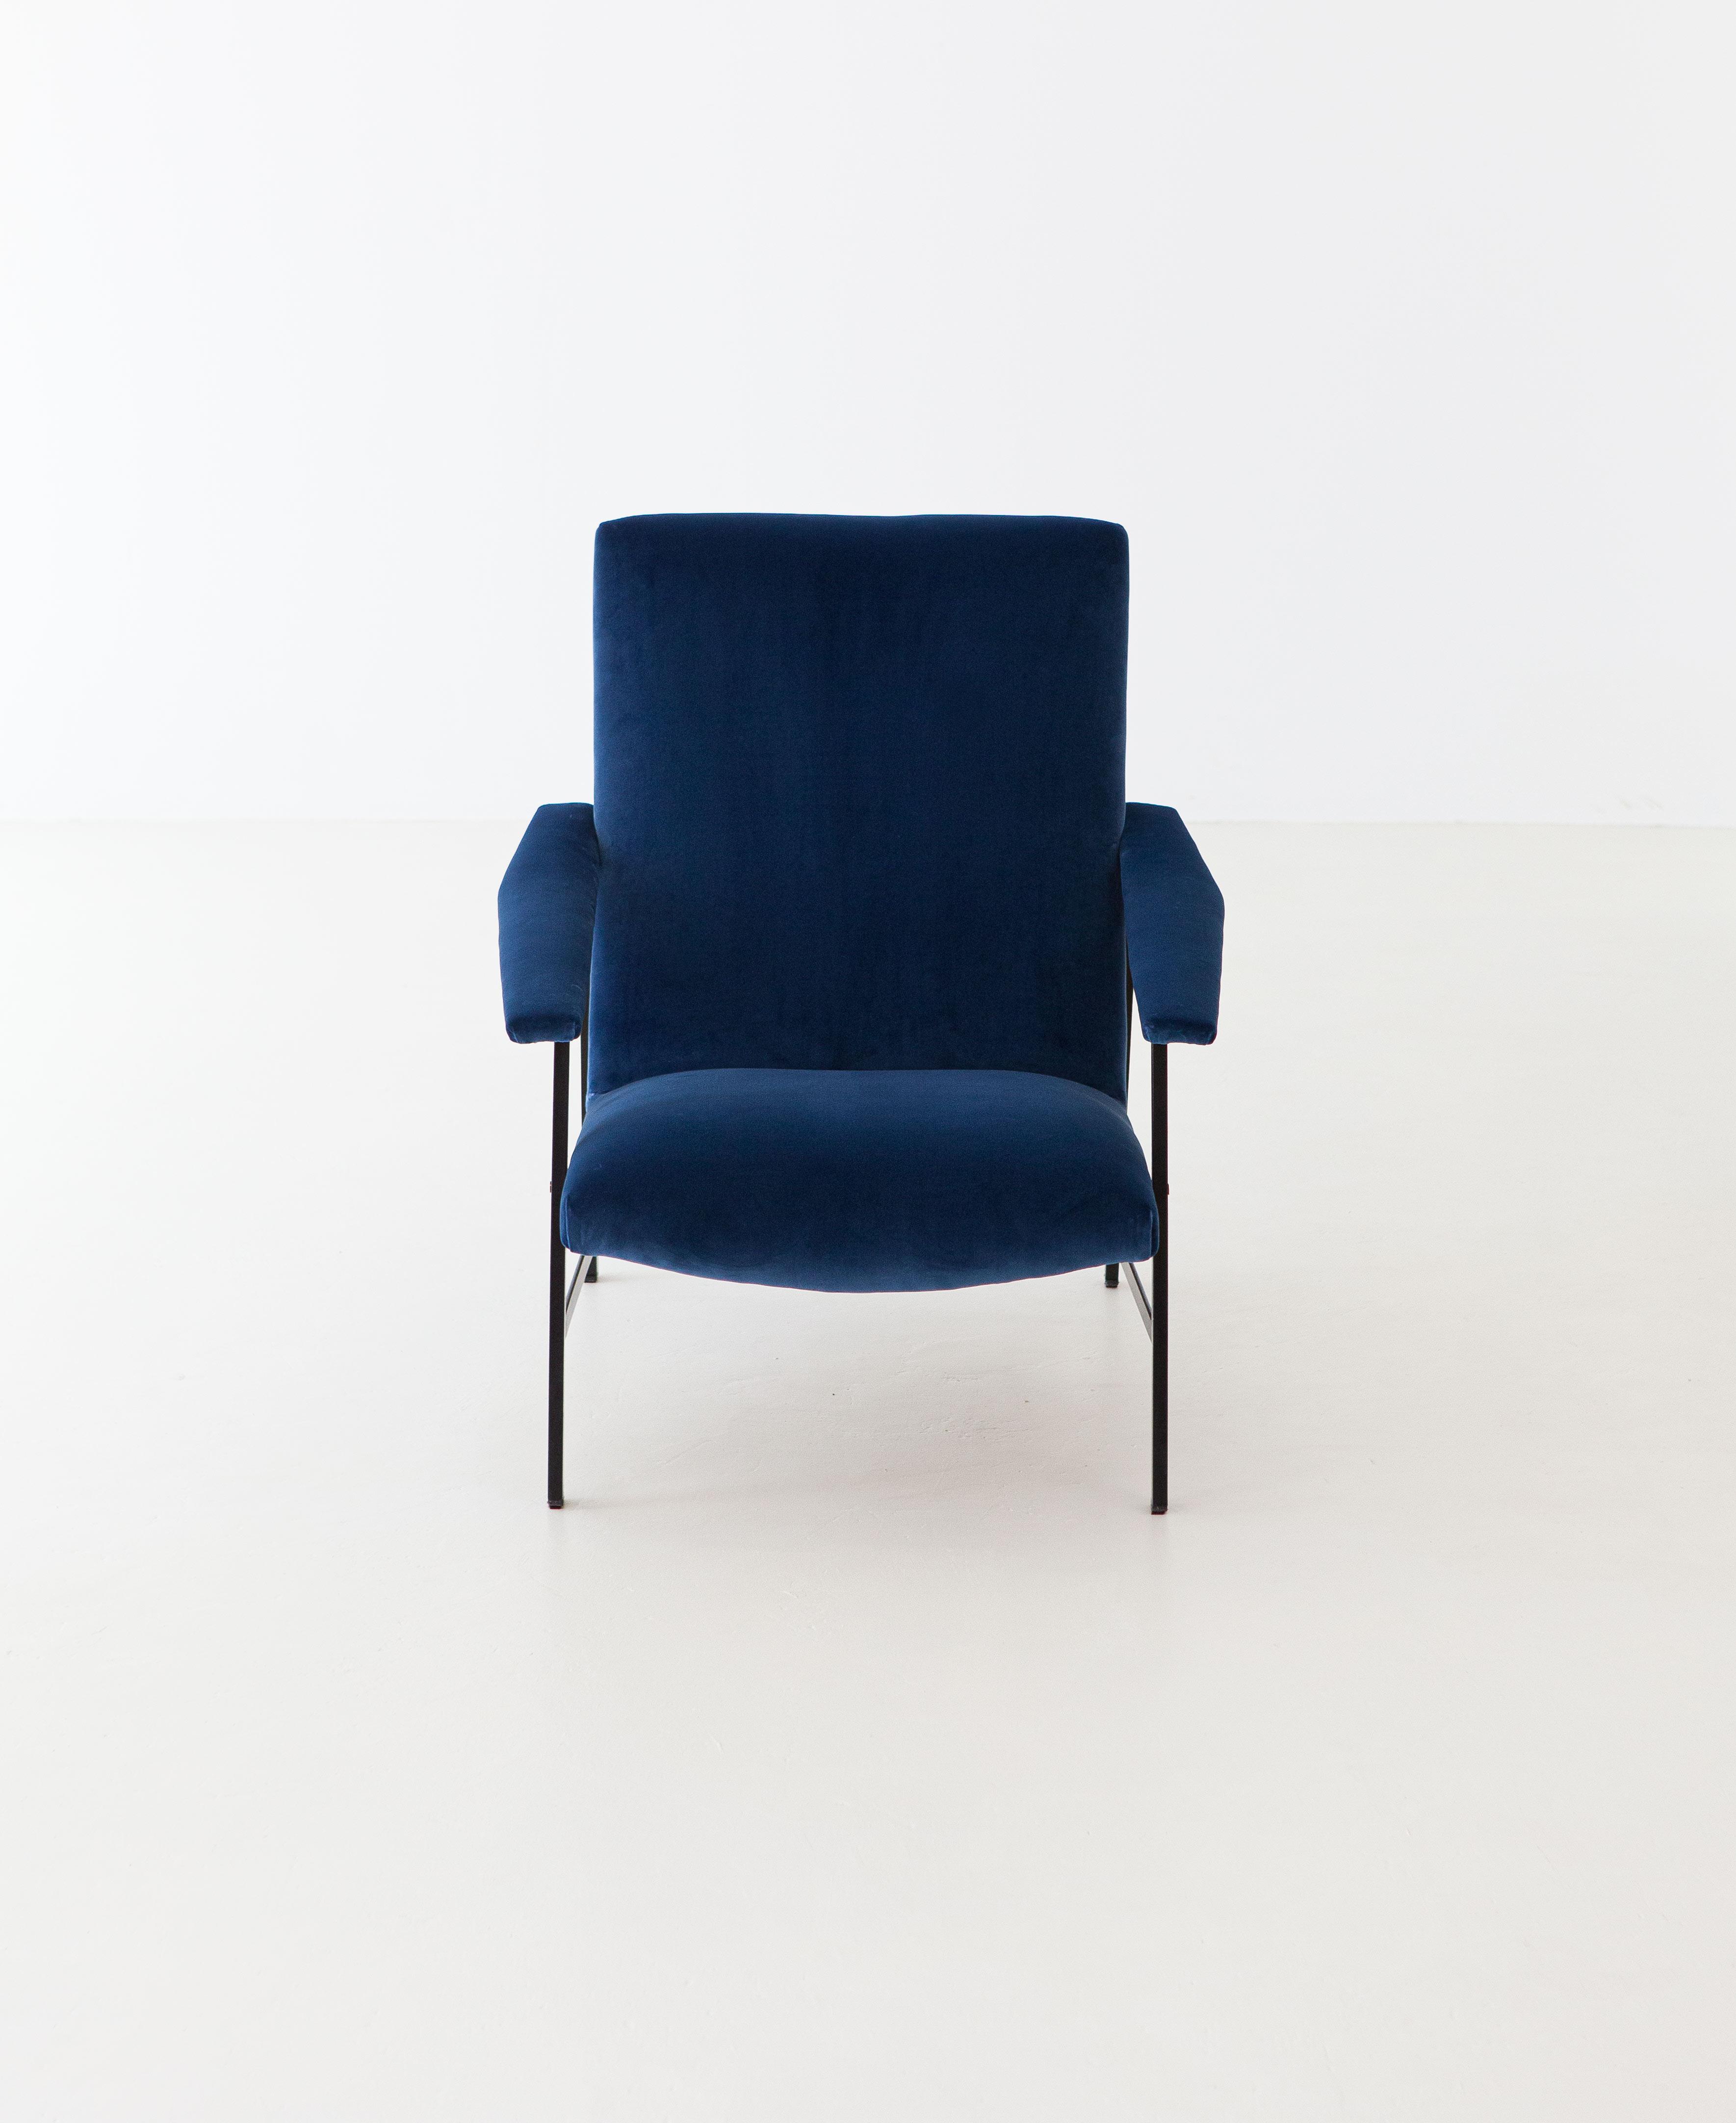 1950s-Italian-blu-velvet-lounge-armchair-1-SE295